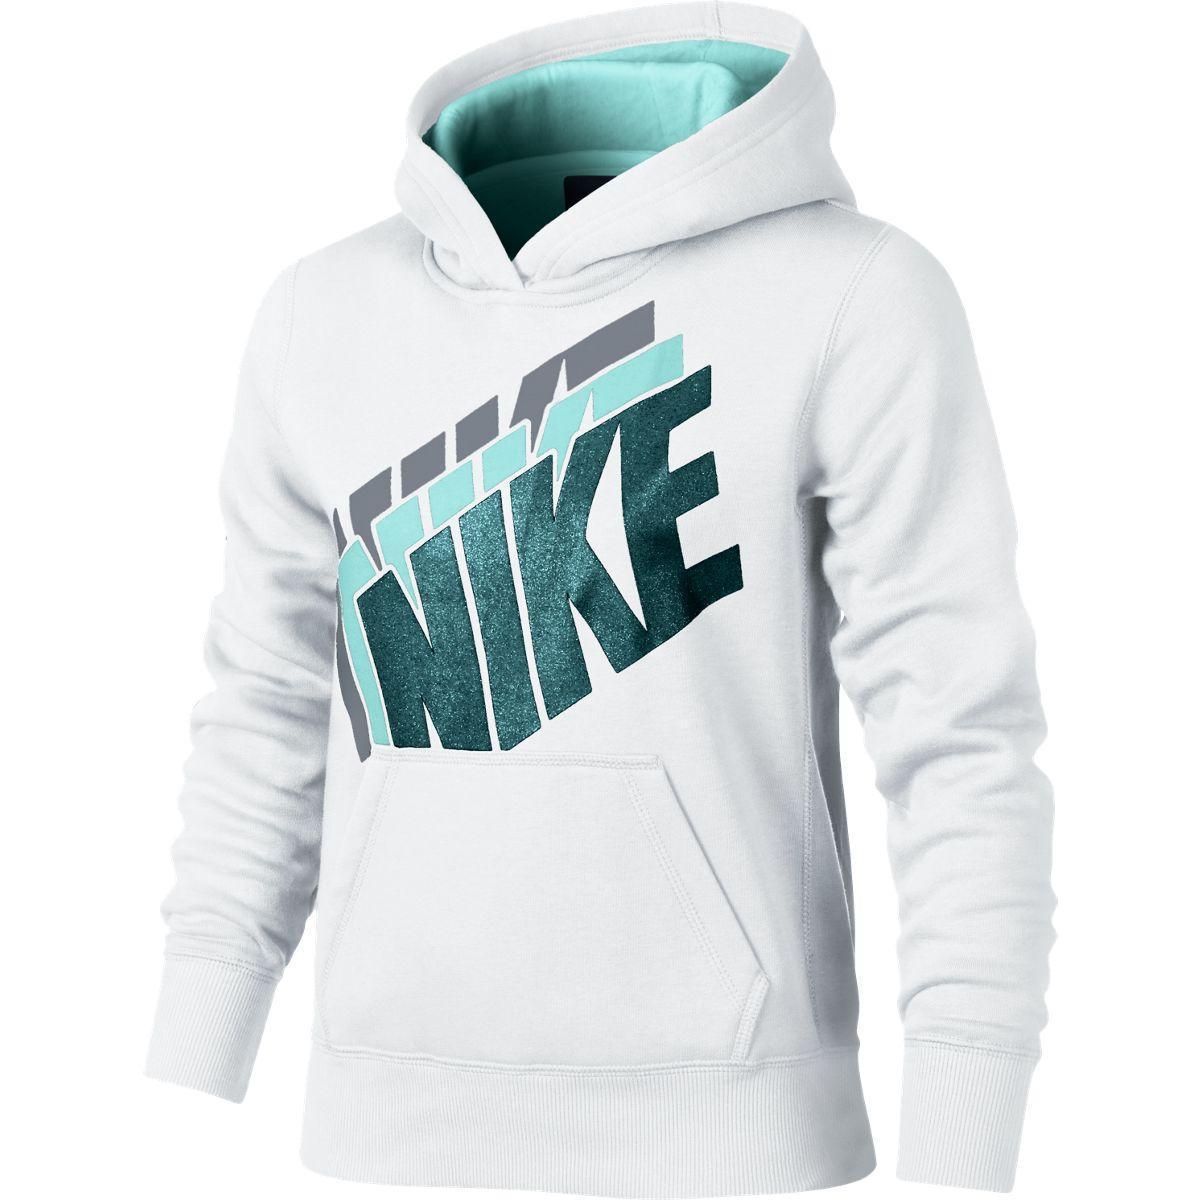 Nike Girls YA76 Brushed Fleece Hoodie - White/Teal Tint ...